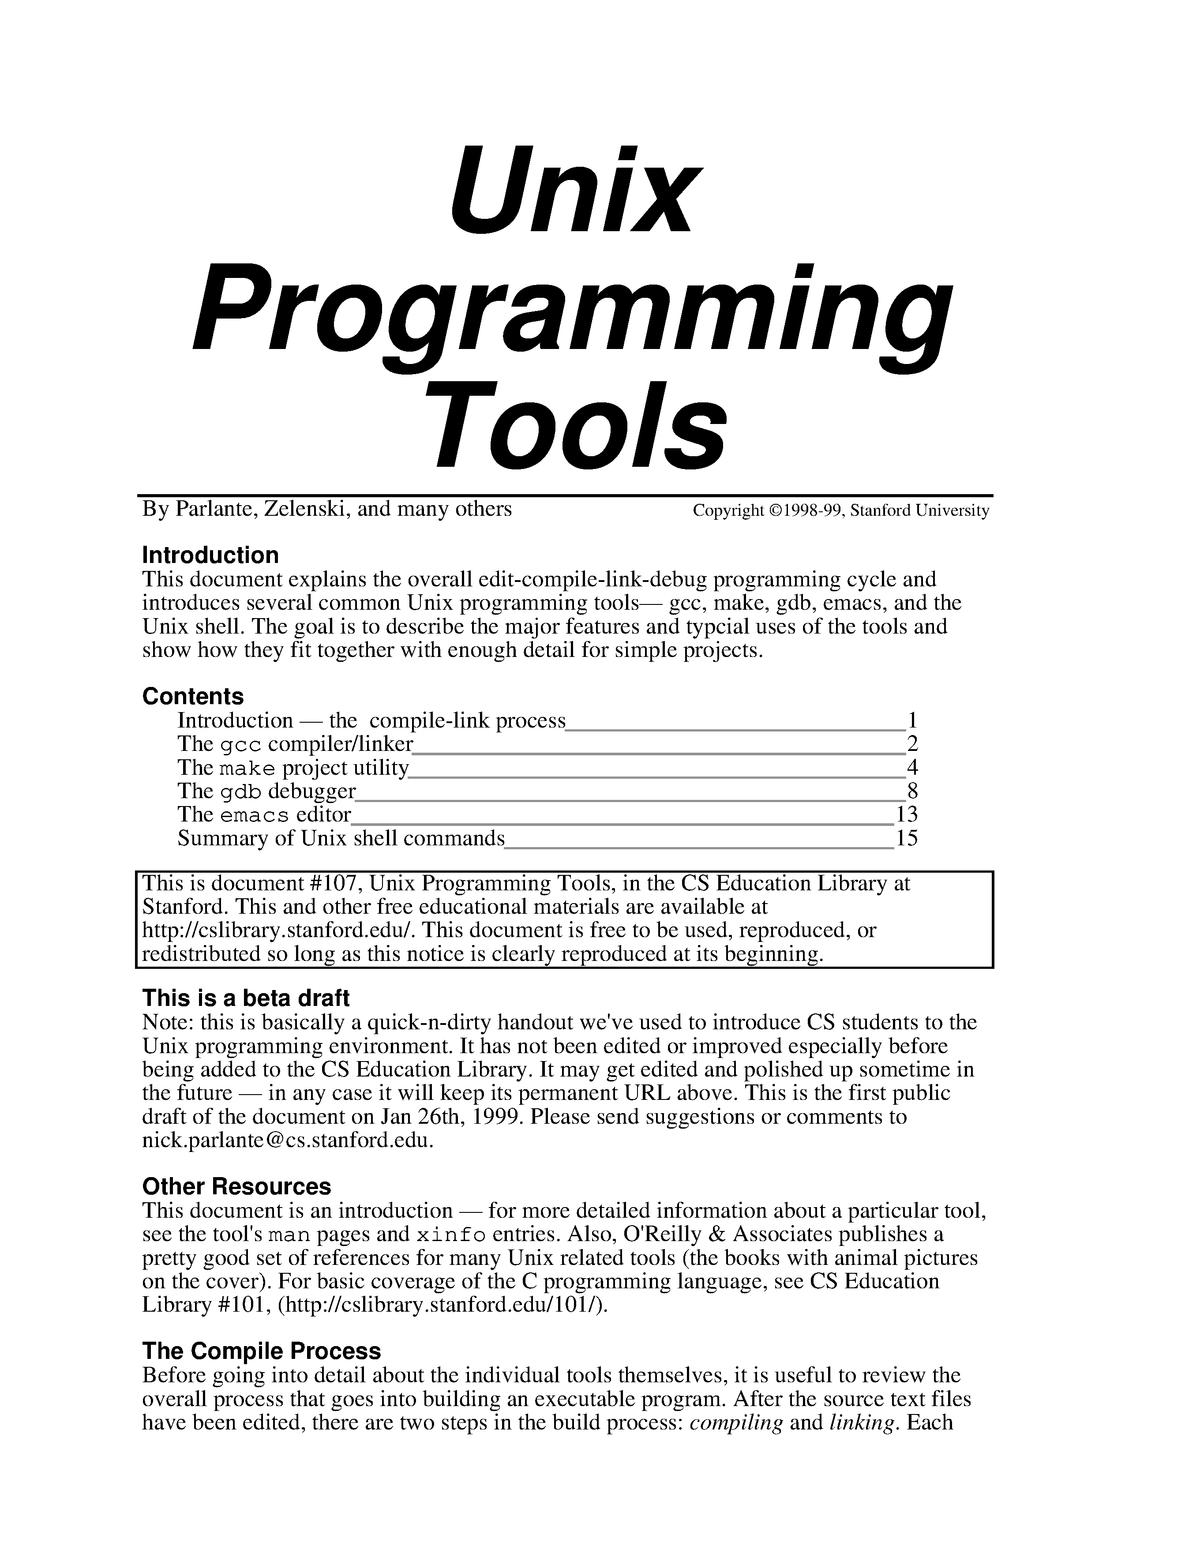 Unix Programming Tools - Sistemas Operativos SO1718